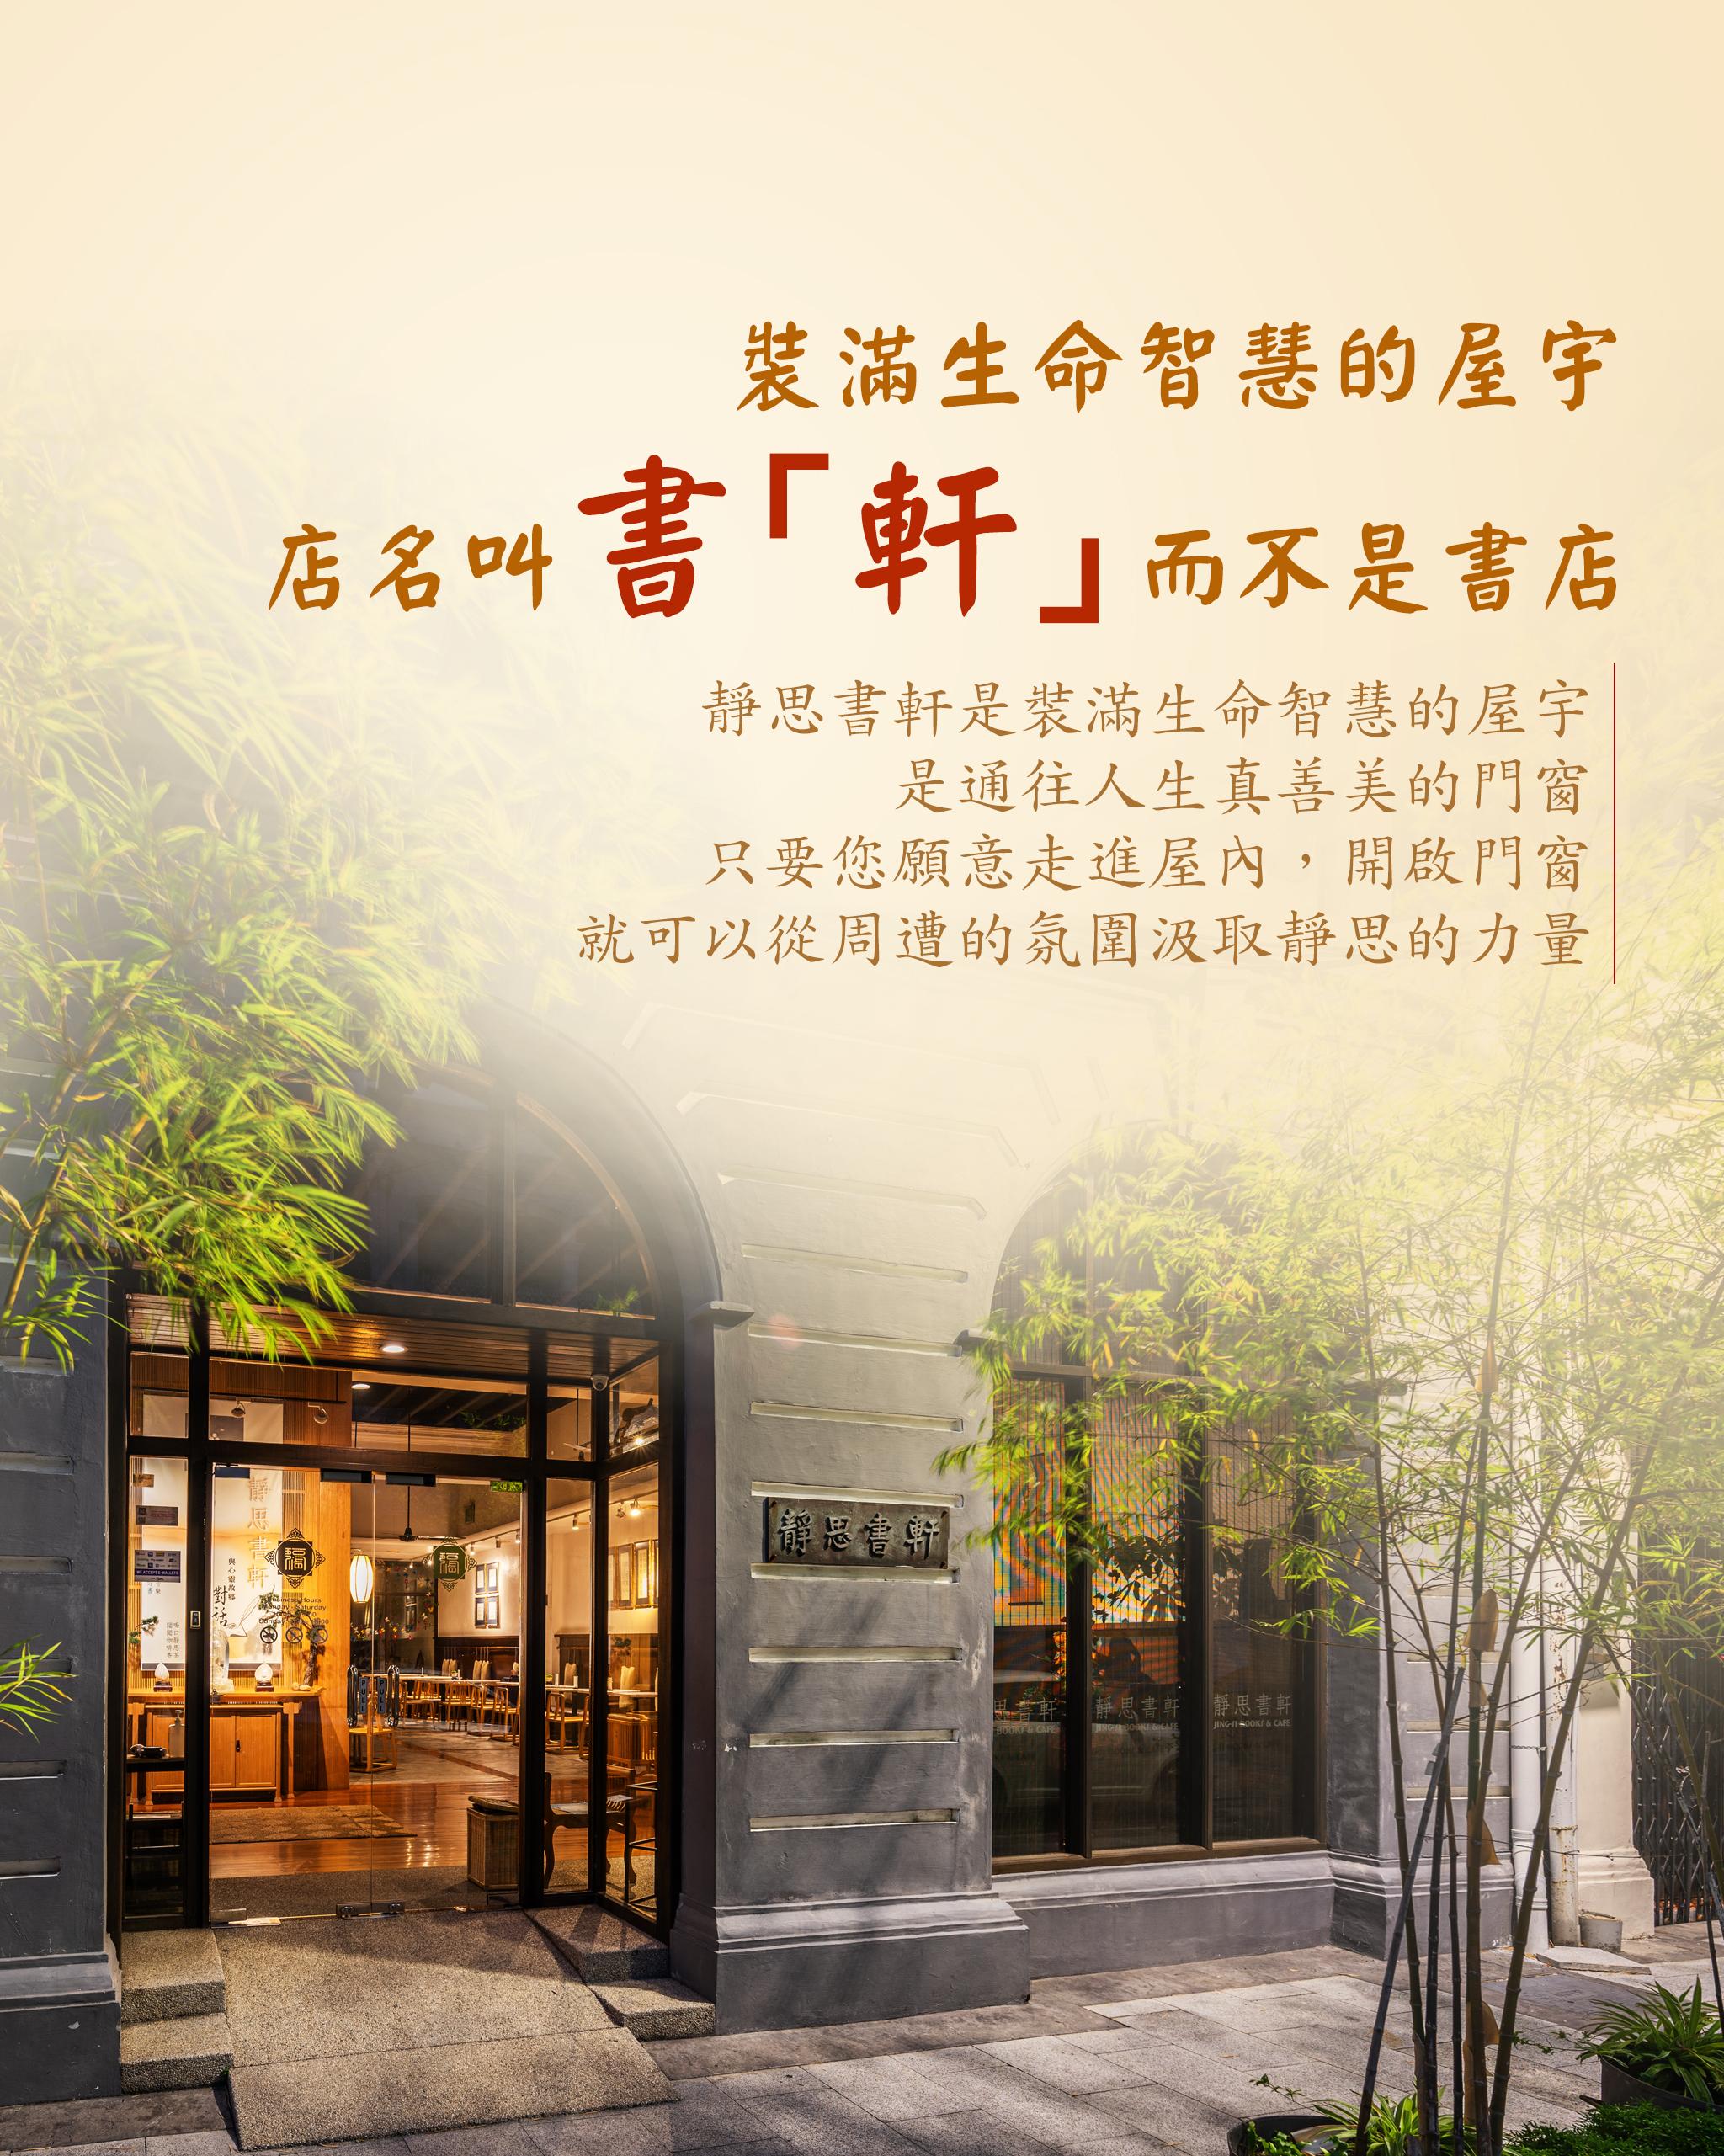 Jing Si Books & Cafe |